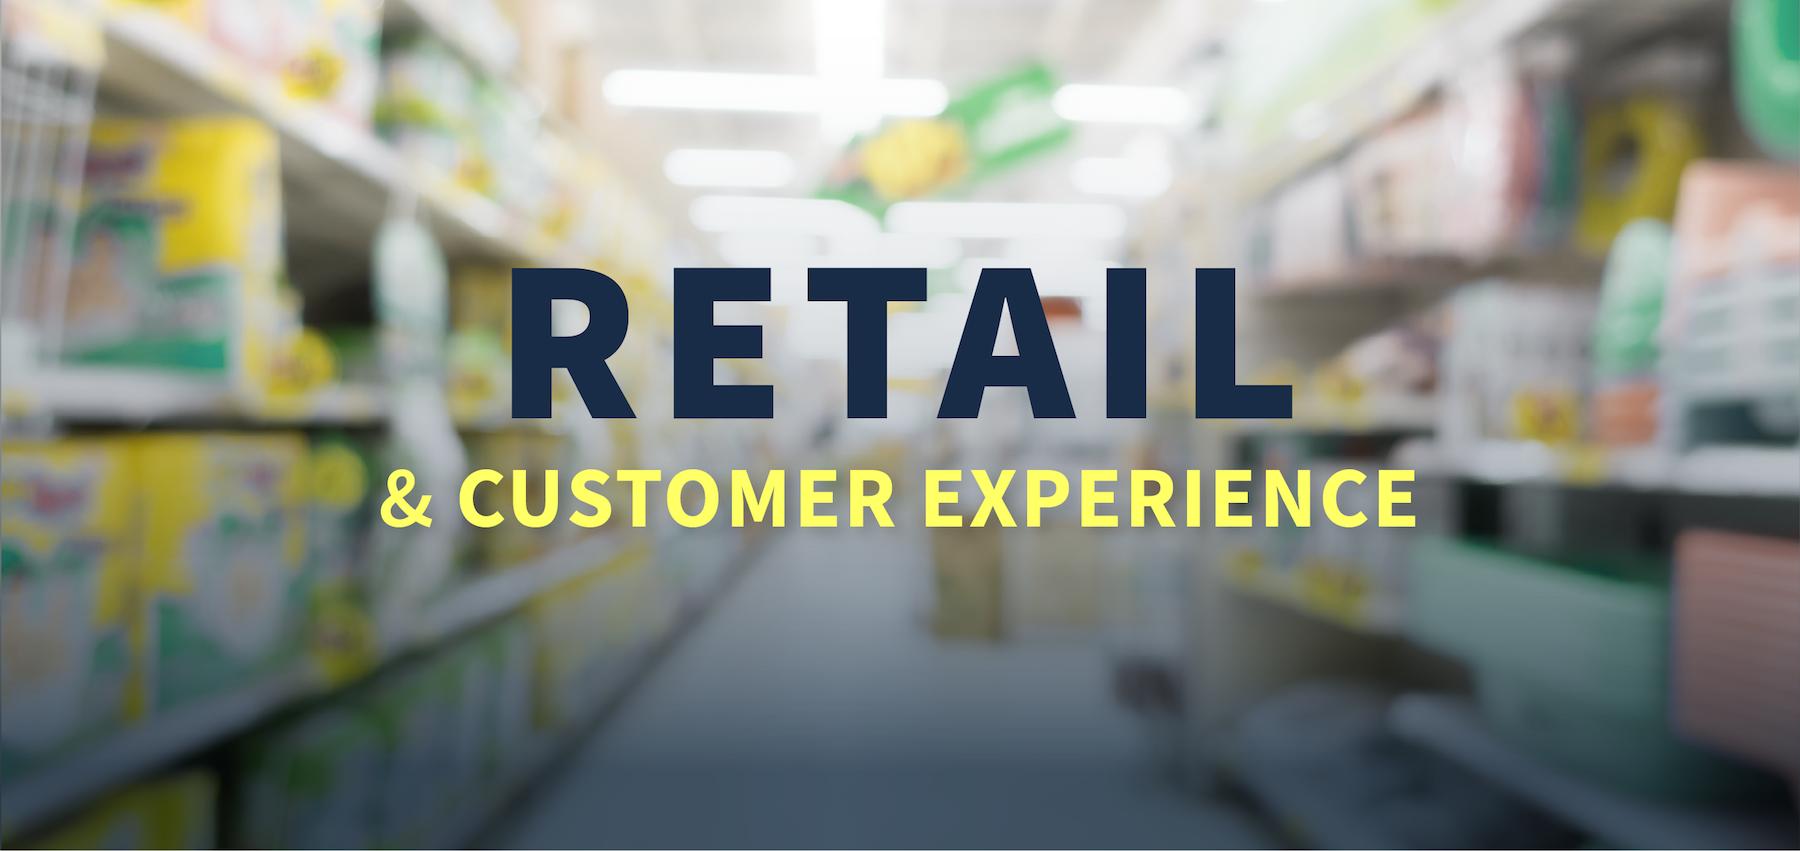 Retail & Customer Experience